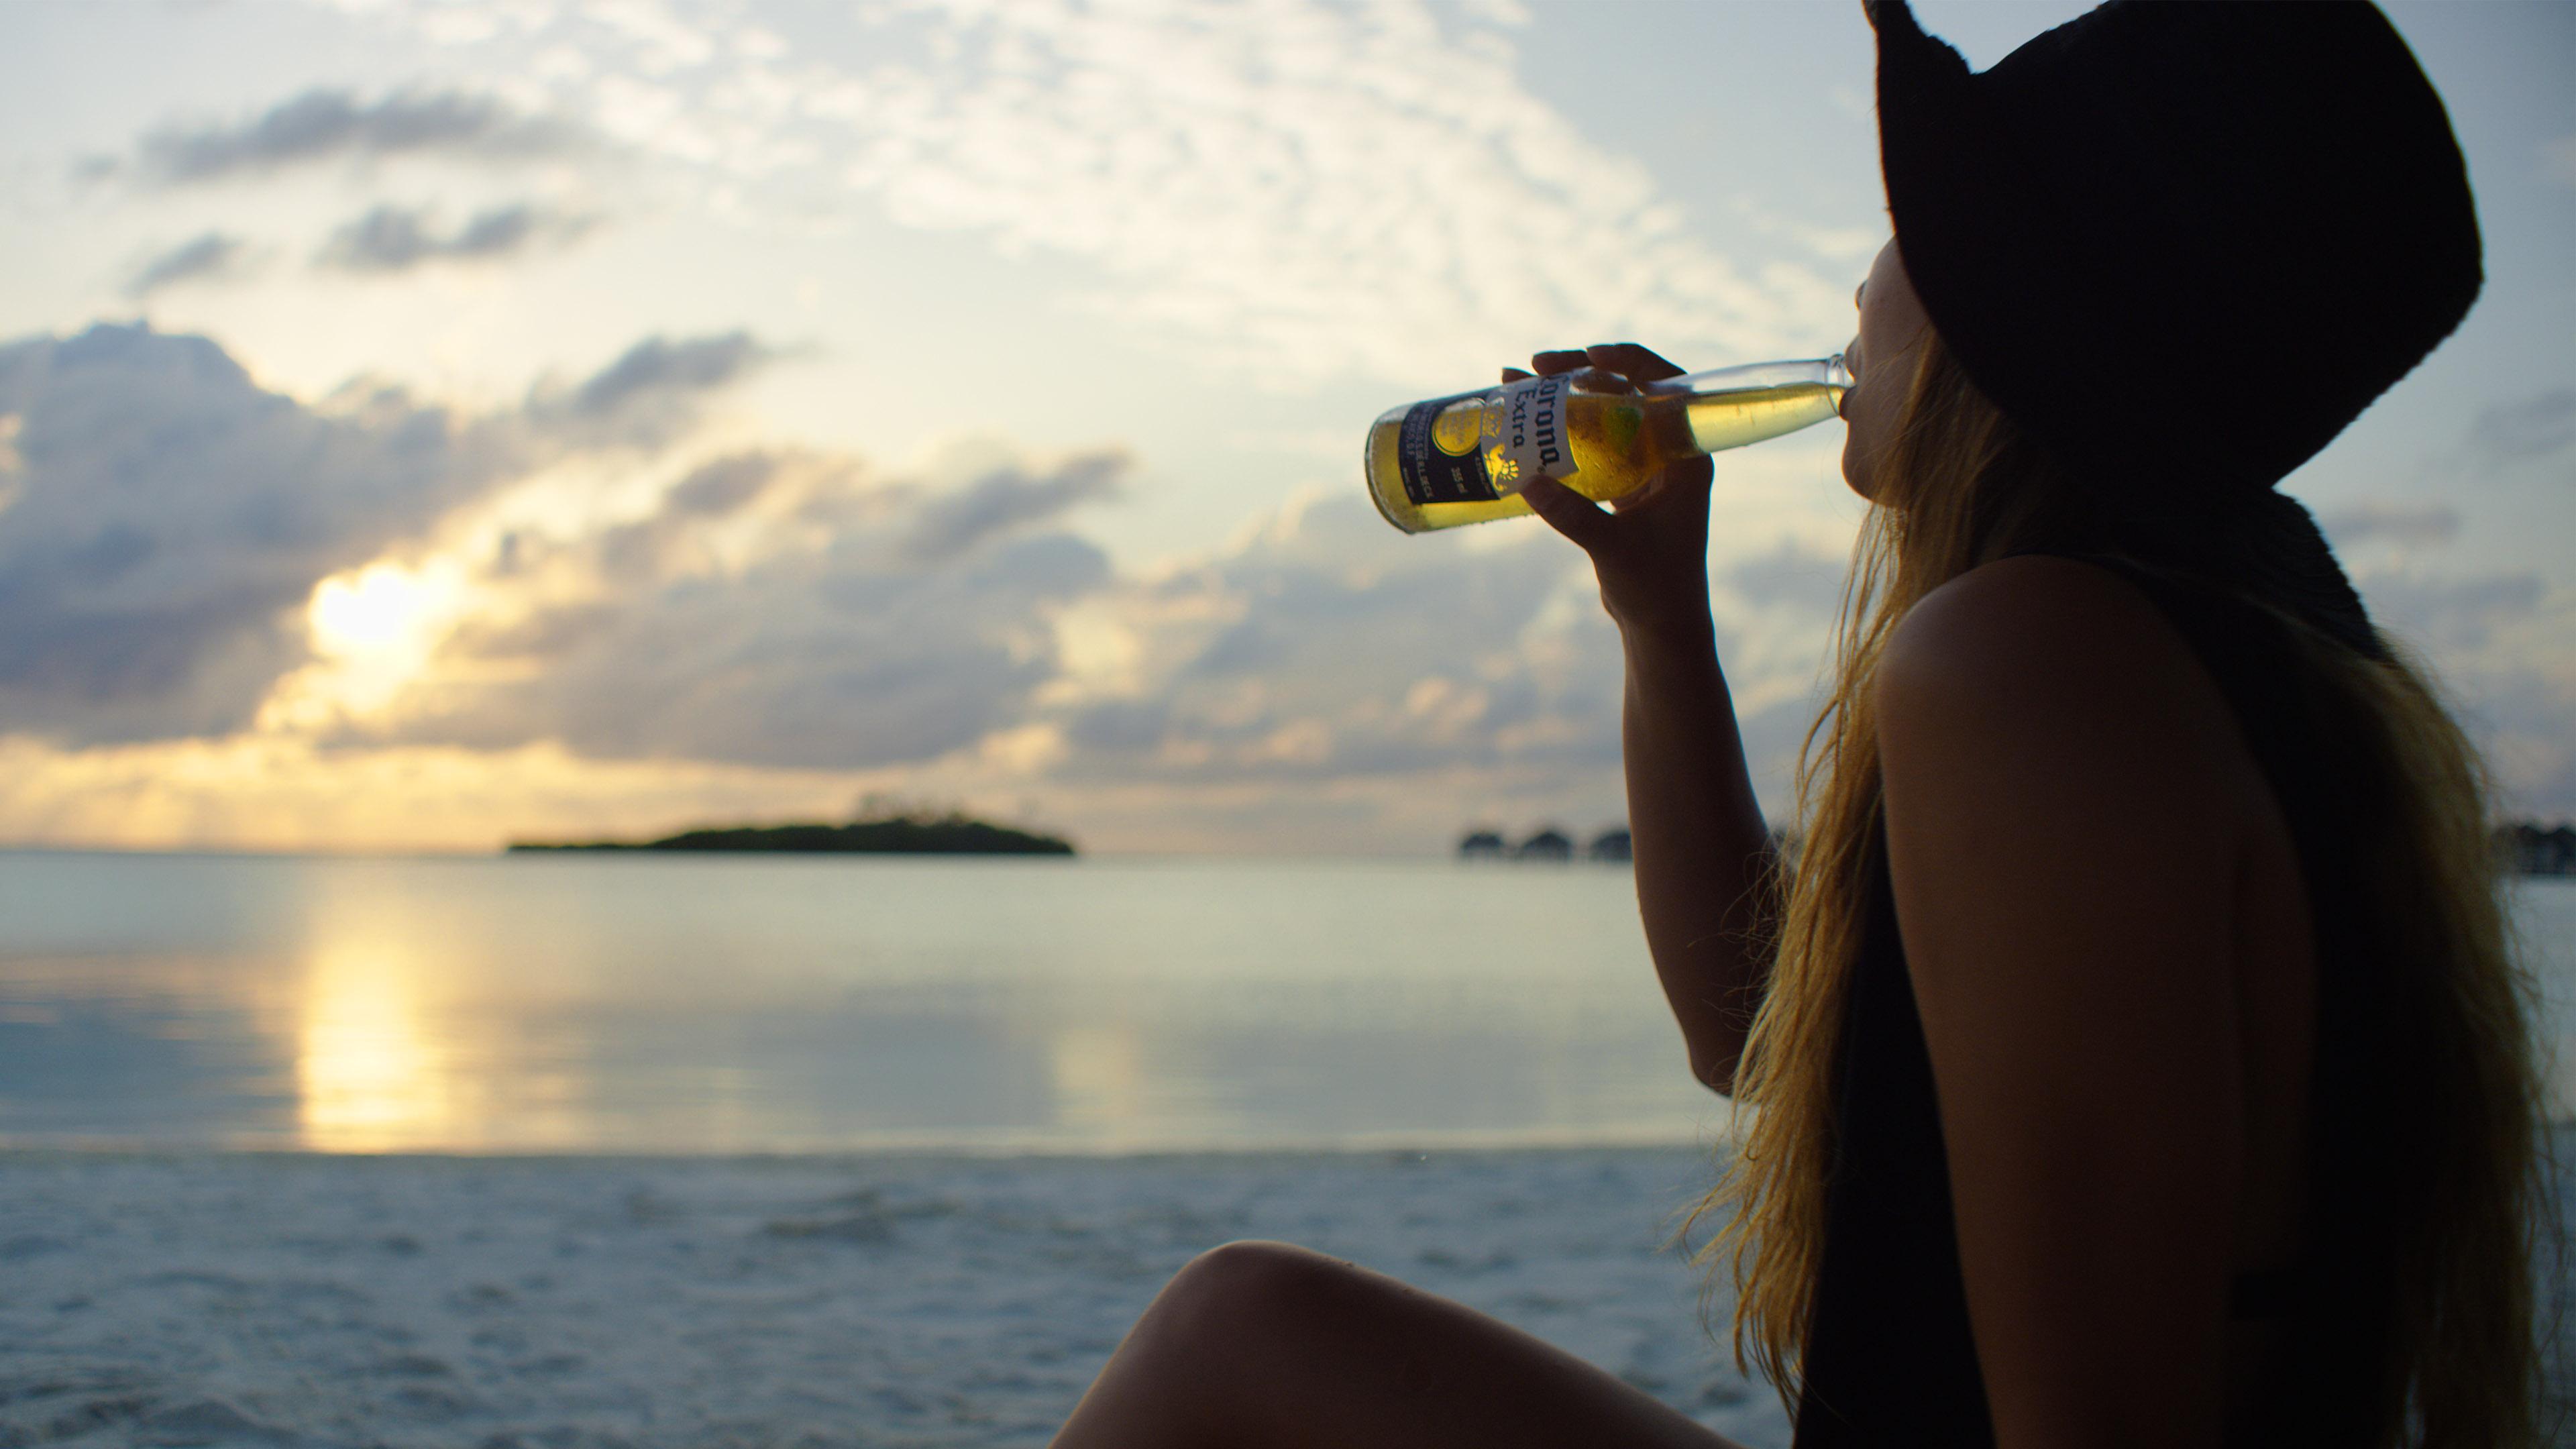 Corona Maldive 4K_Model_Red Dragon_Cinematography